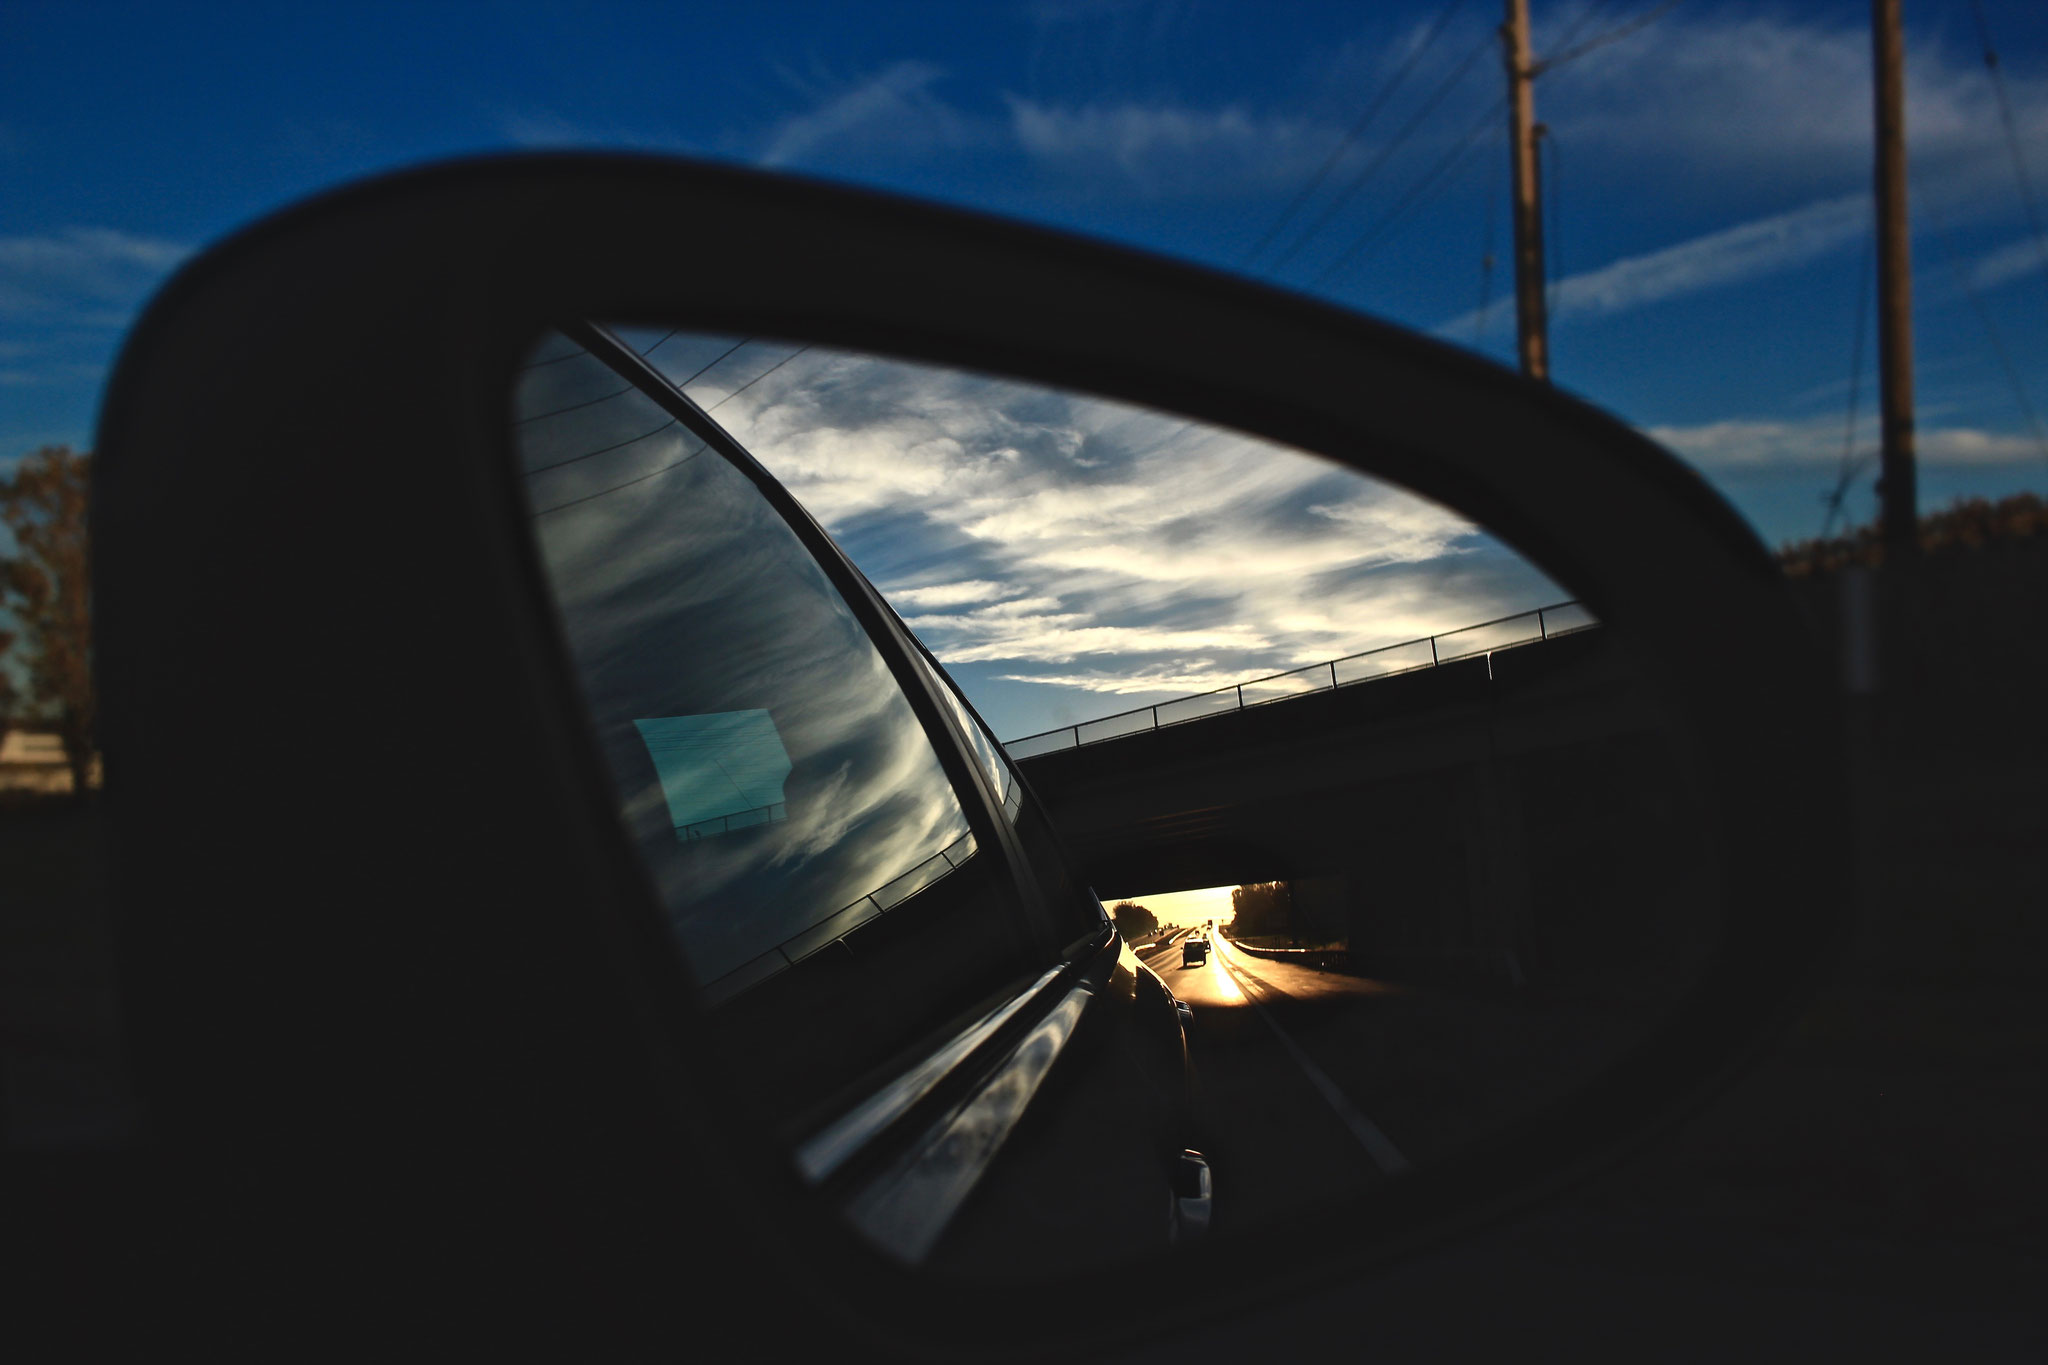 New York Highway, USA 2015